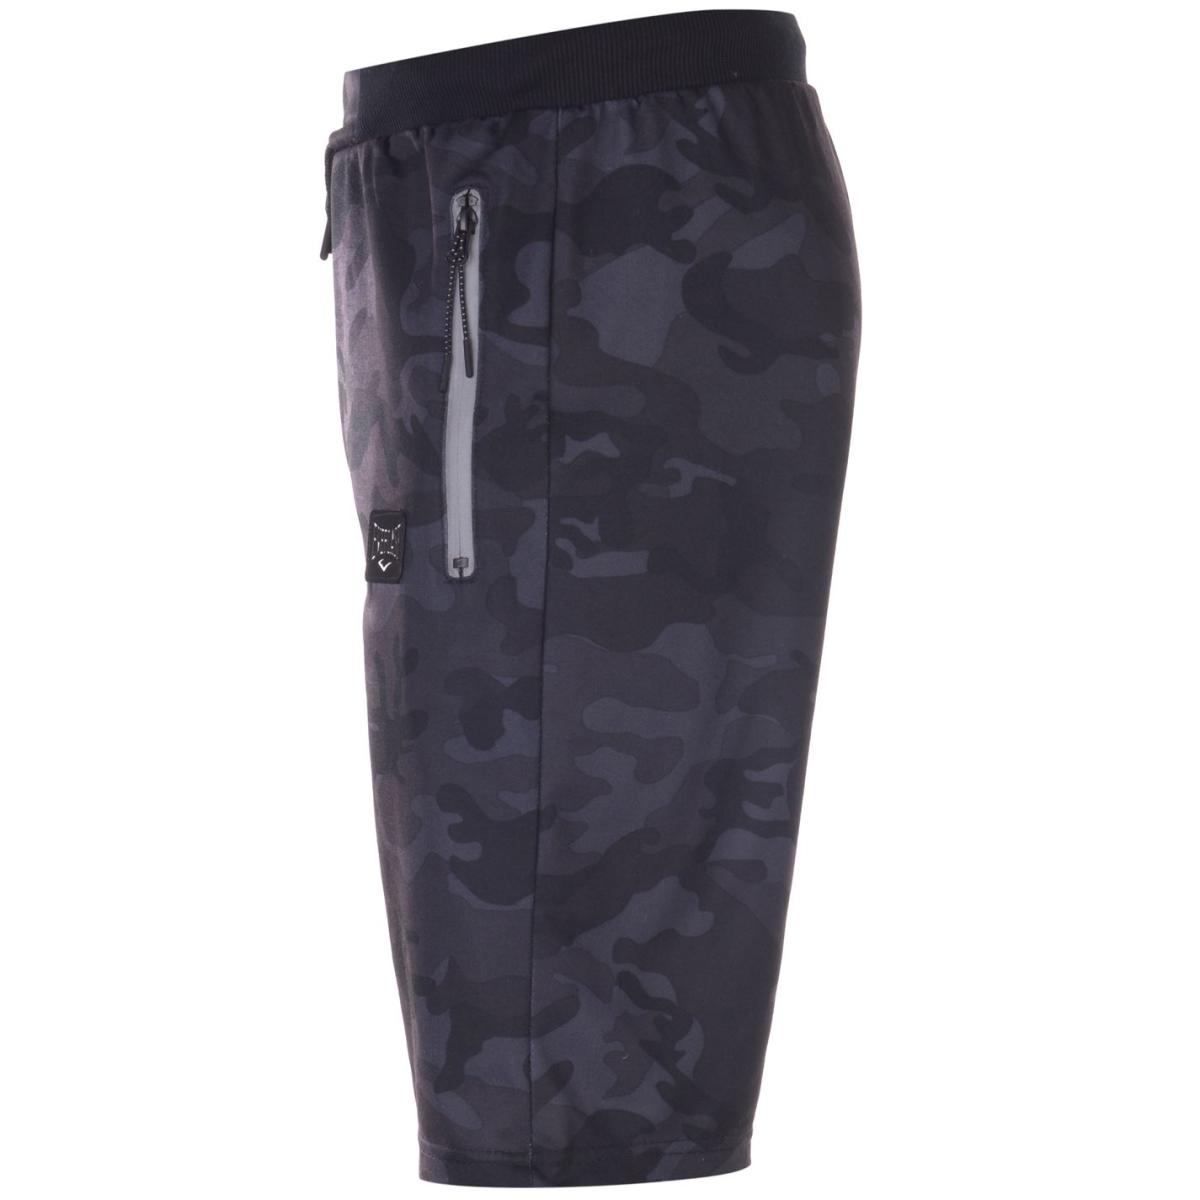 EVERLAST-Uomo-Shorts-Pantaloni-Sportivi-Corti-Bermuda-Pantaloni-Pantaloni-sportivi-6015-Premier miniatura 4